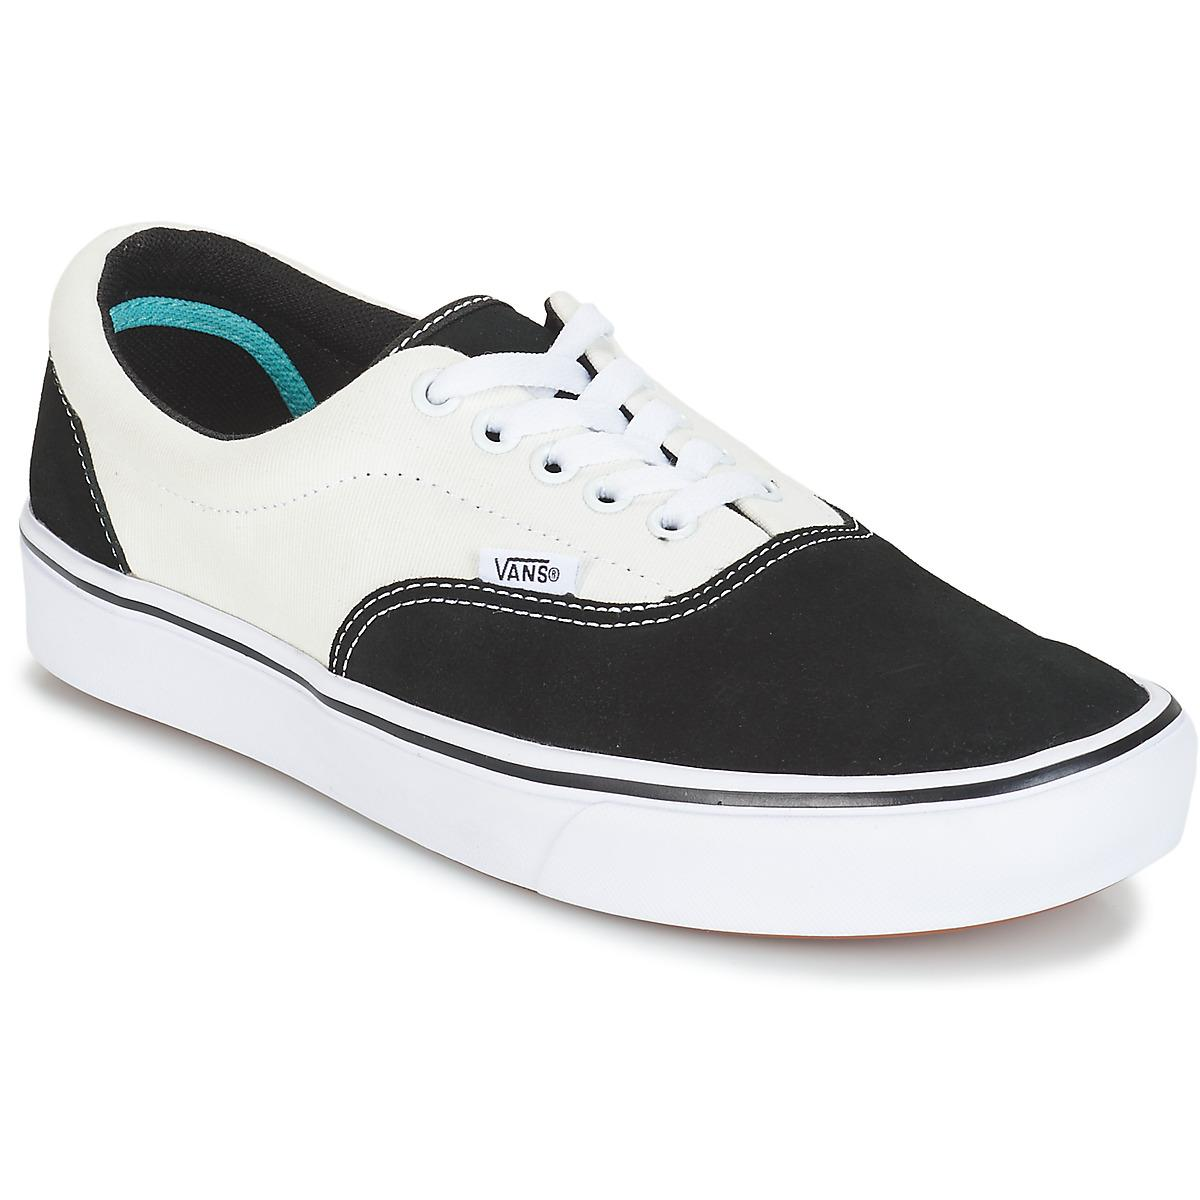 Vans Comfycush Era Men s Shoes (trainers) In Black in Black for Men ... 0a2ddfa68